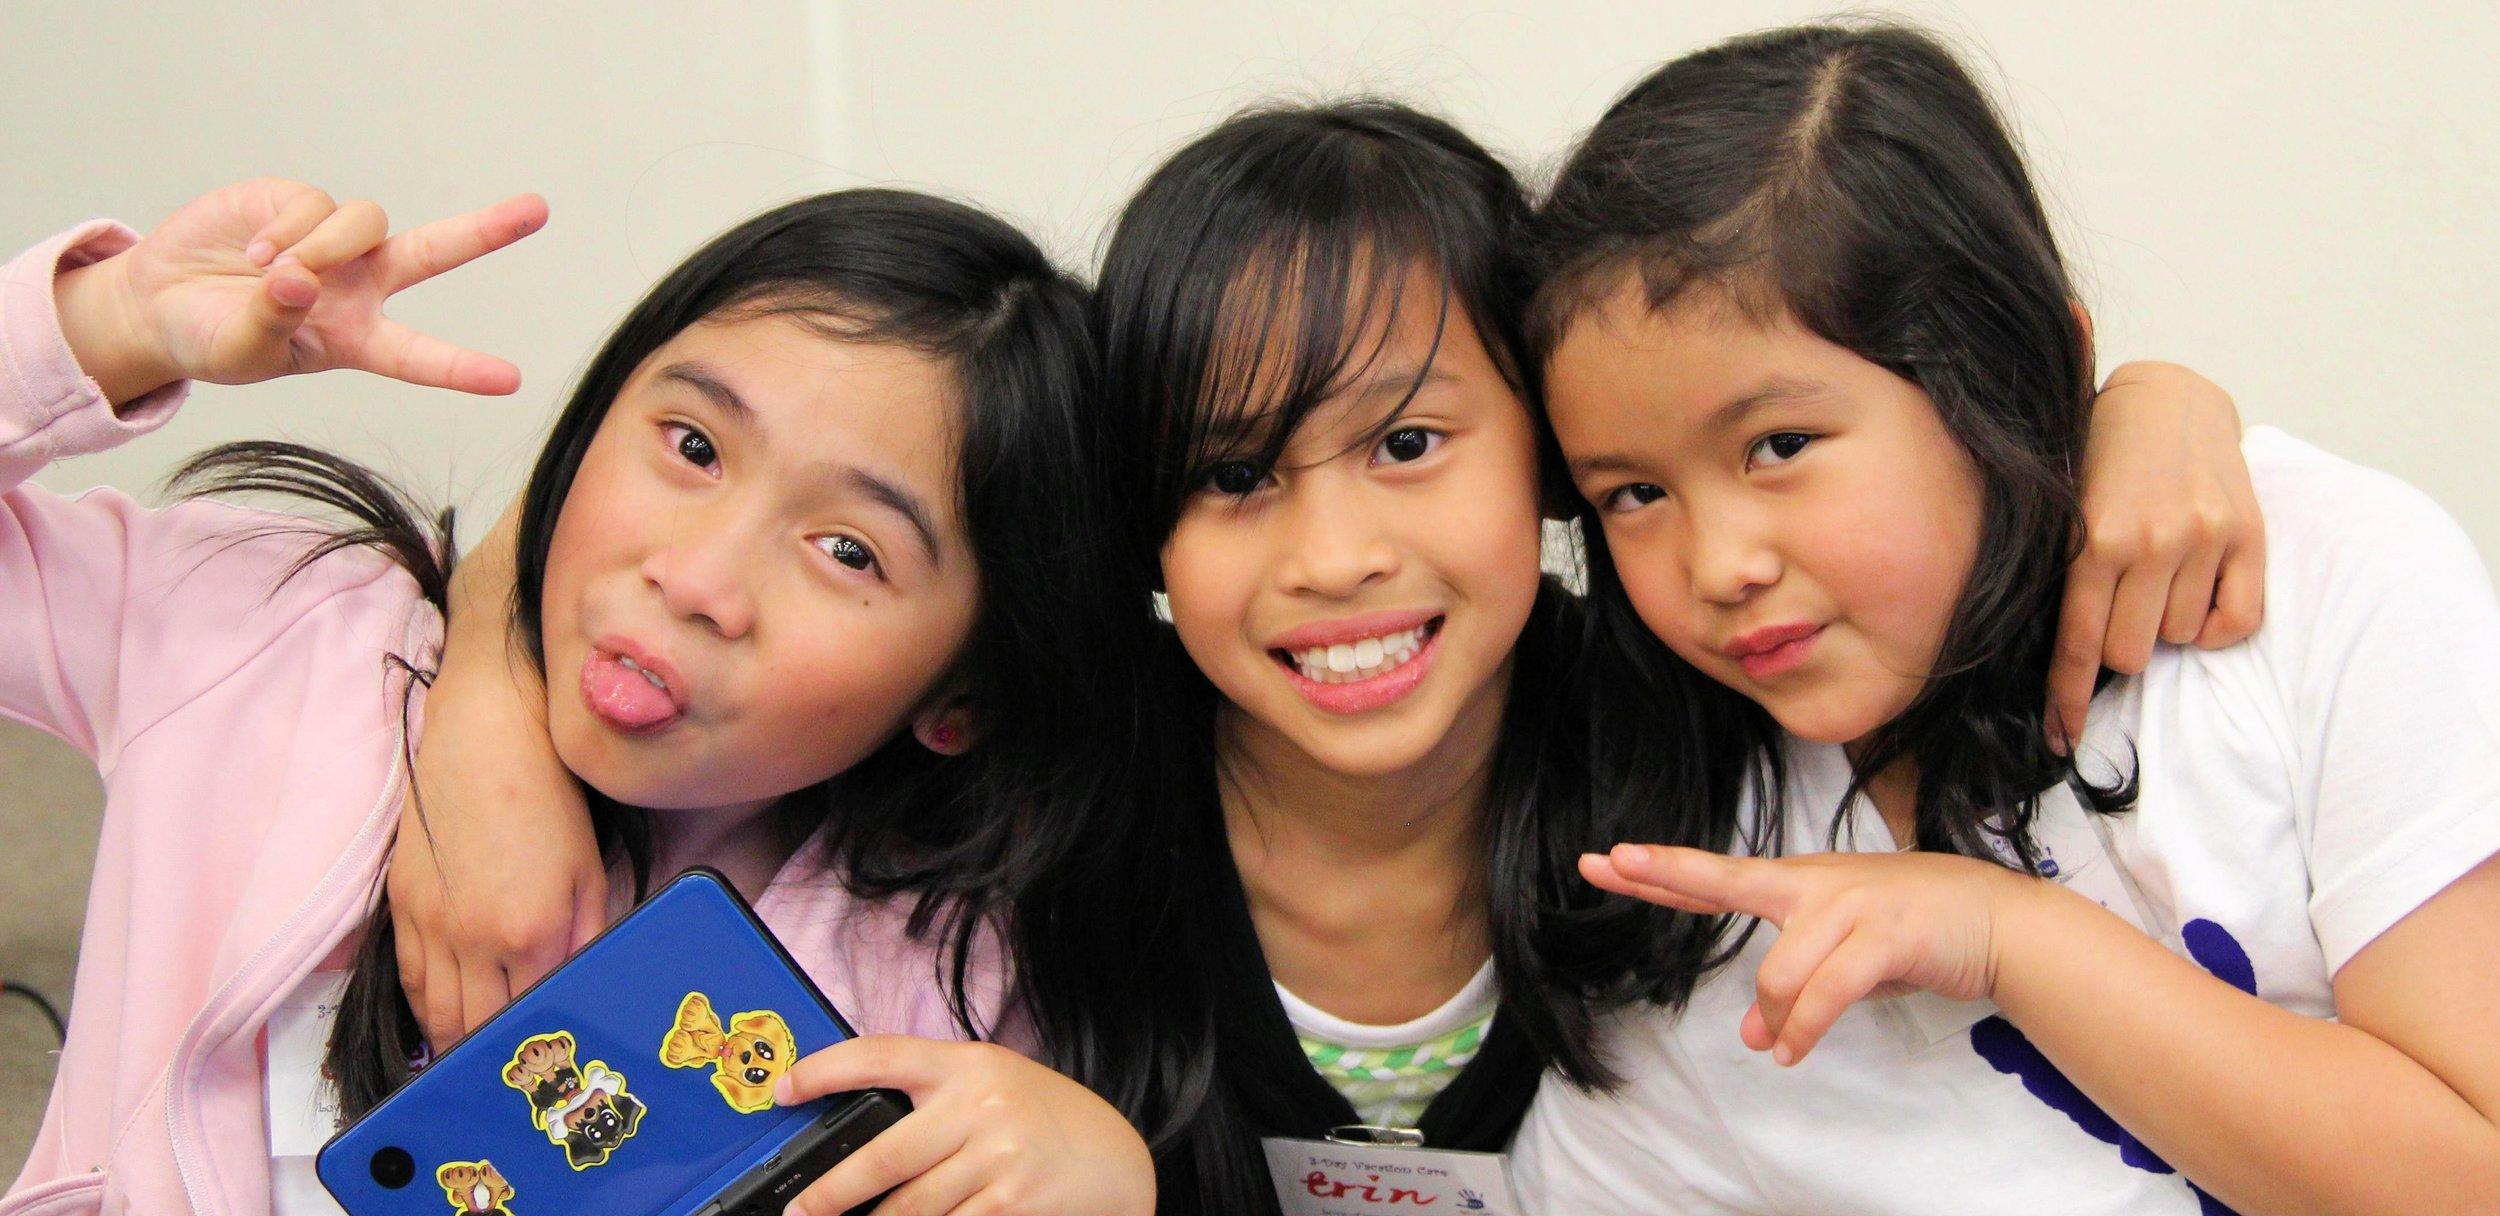 children 9.JPG